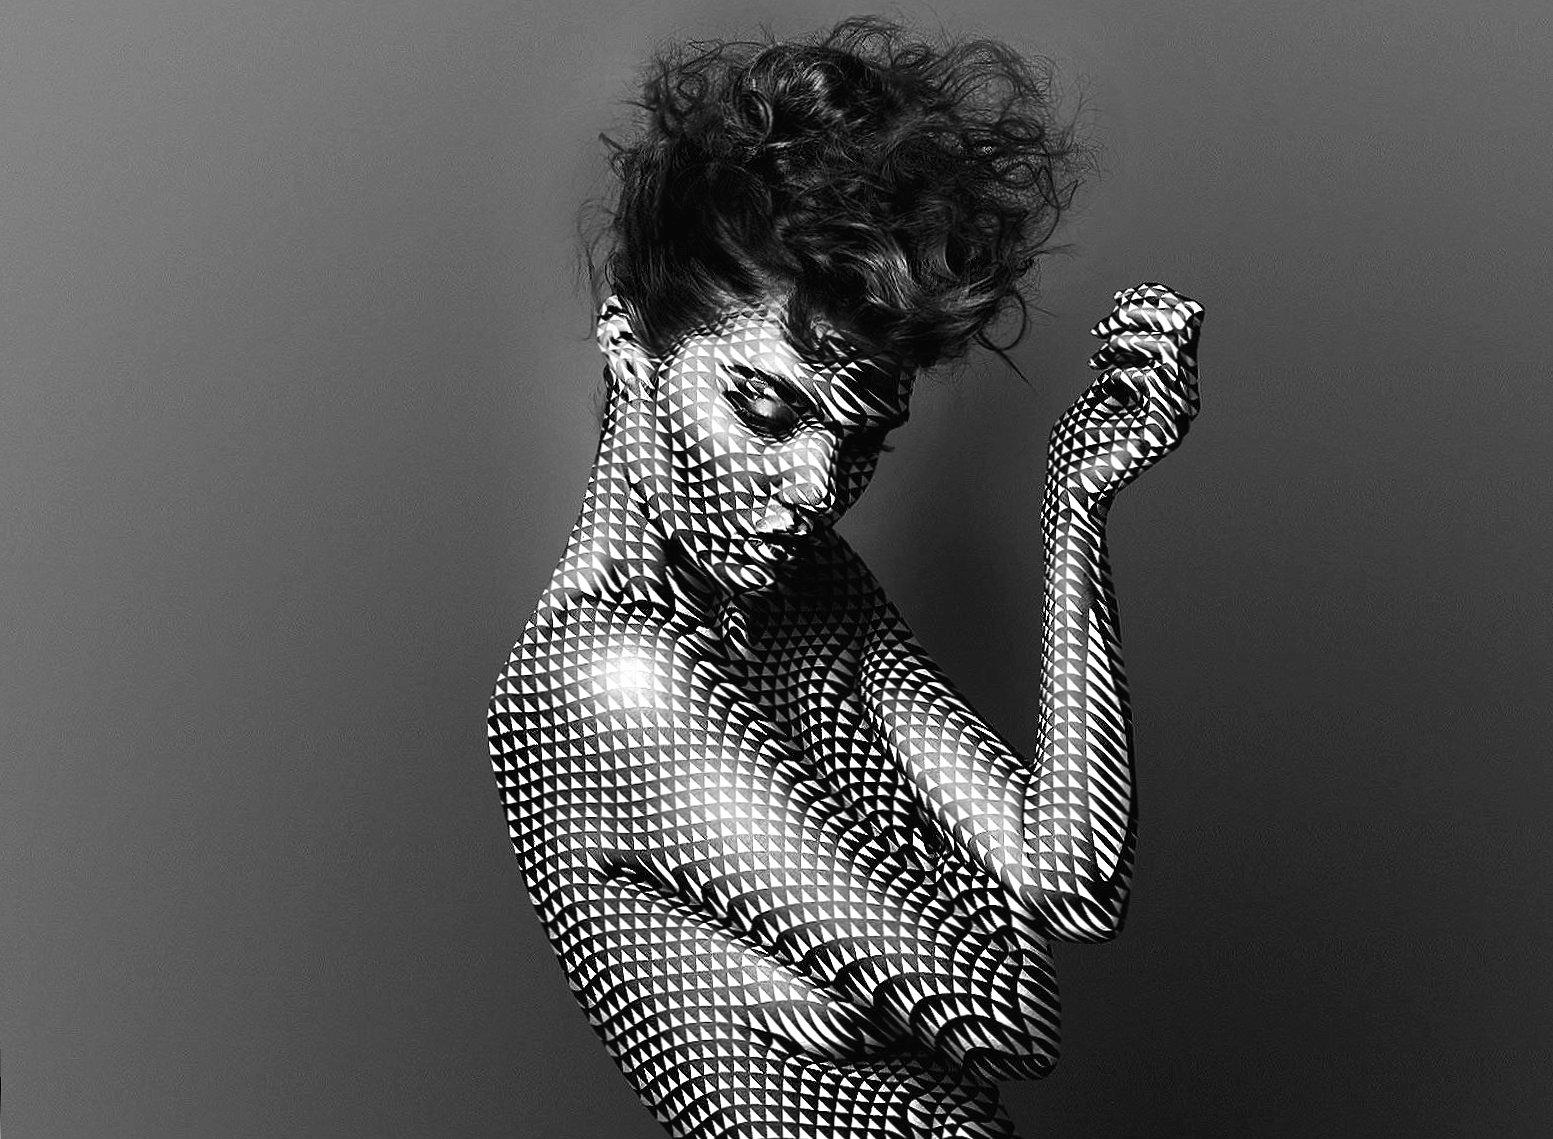 Digital triangle skin woman art wallpapers HD quality